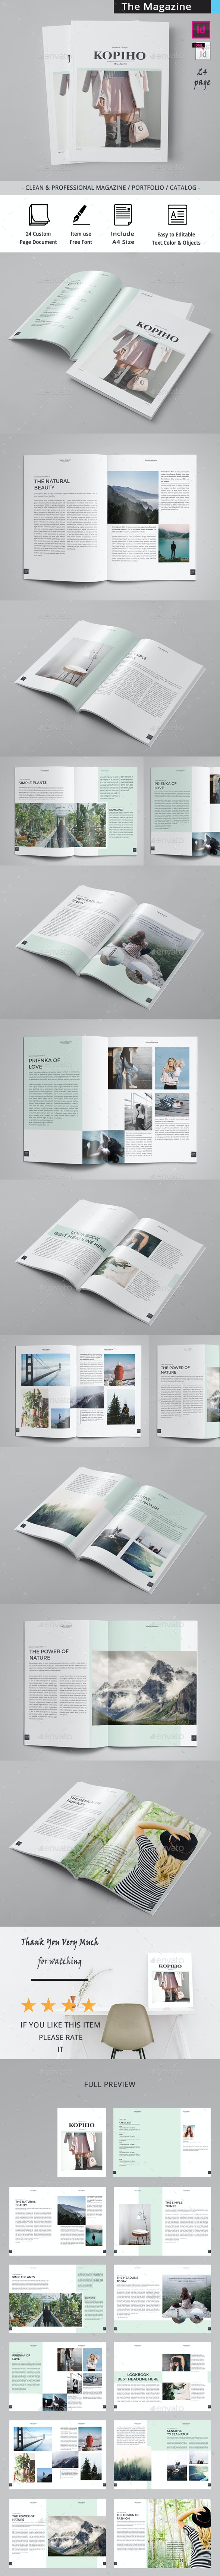 Kopiho Minimal Magazine - Magazines Print Templates